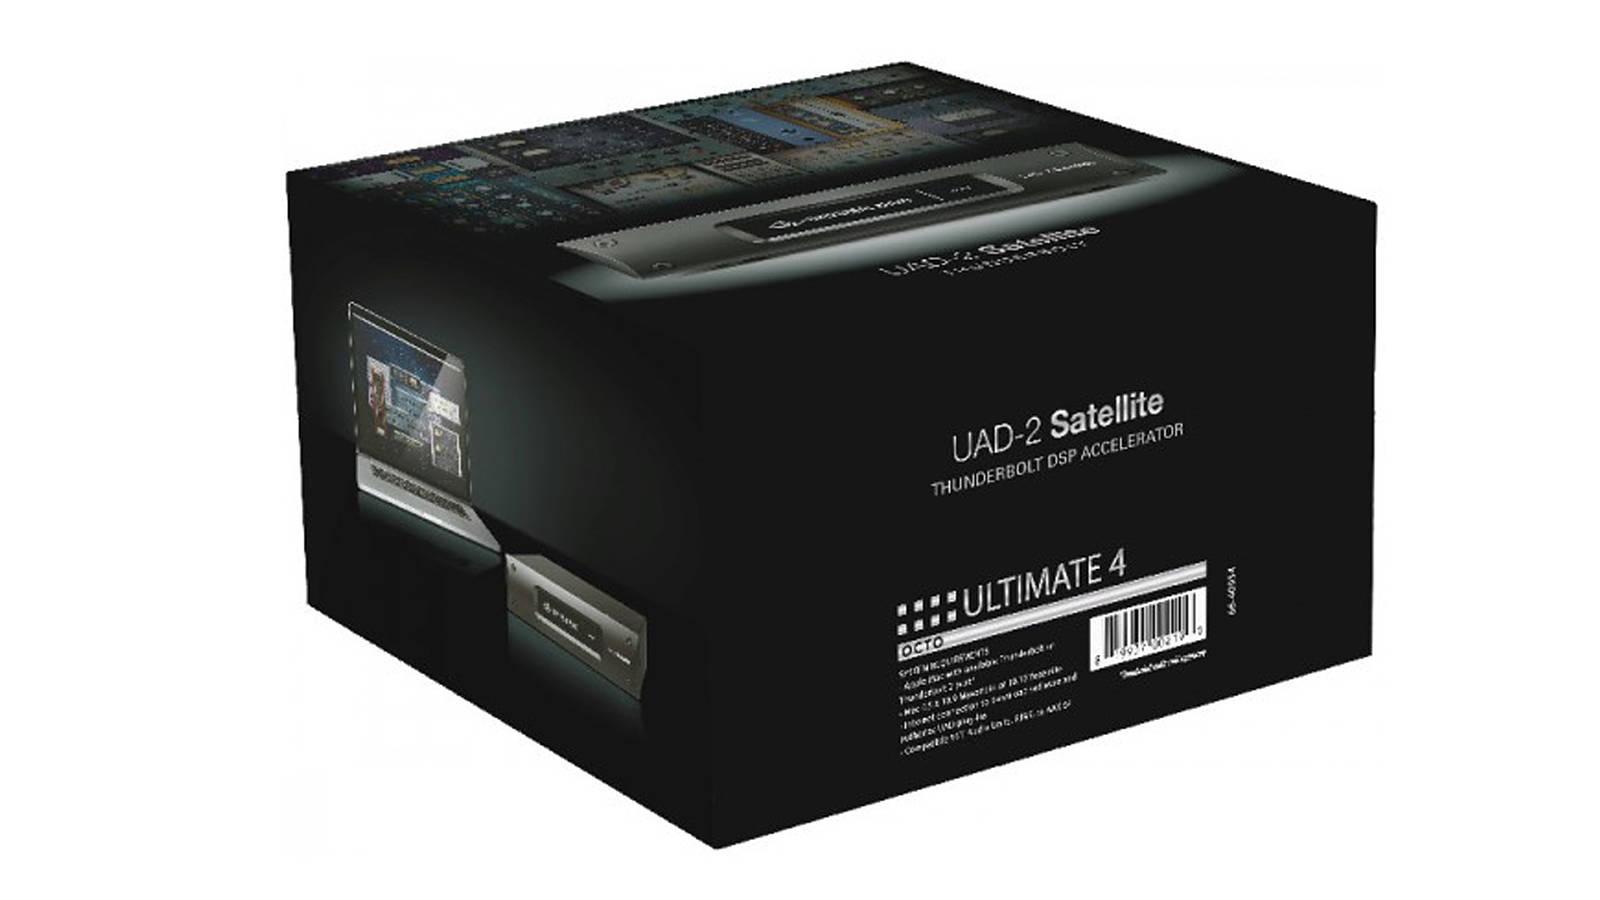 Universal Audio UAD-2 Octo Satellite Thunderbolt Ultimate 4